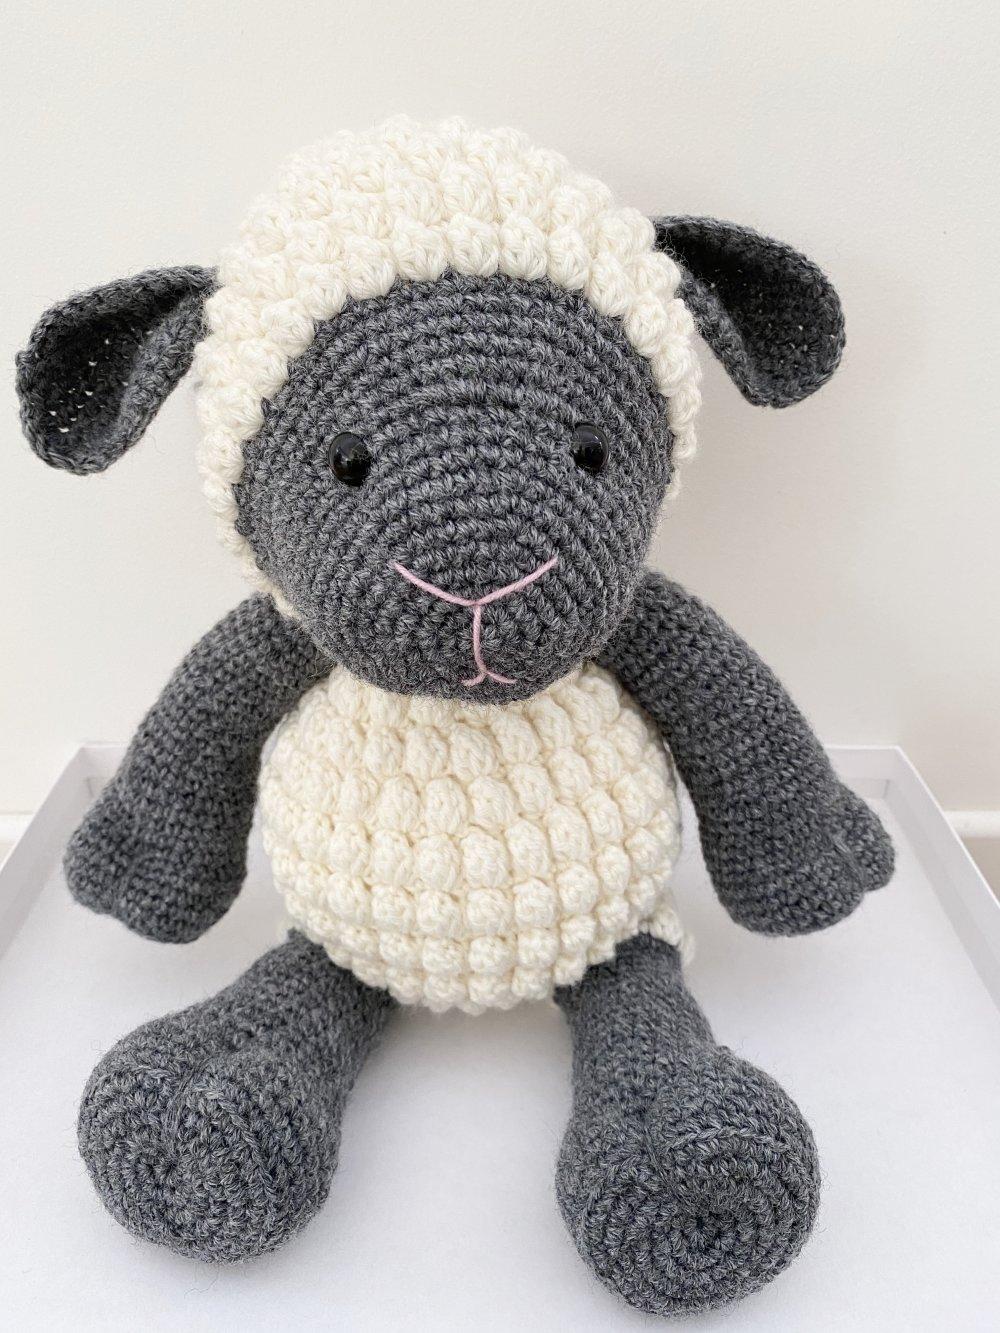 Amigurumi crochet mouton  cadeau naissance